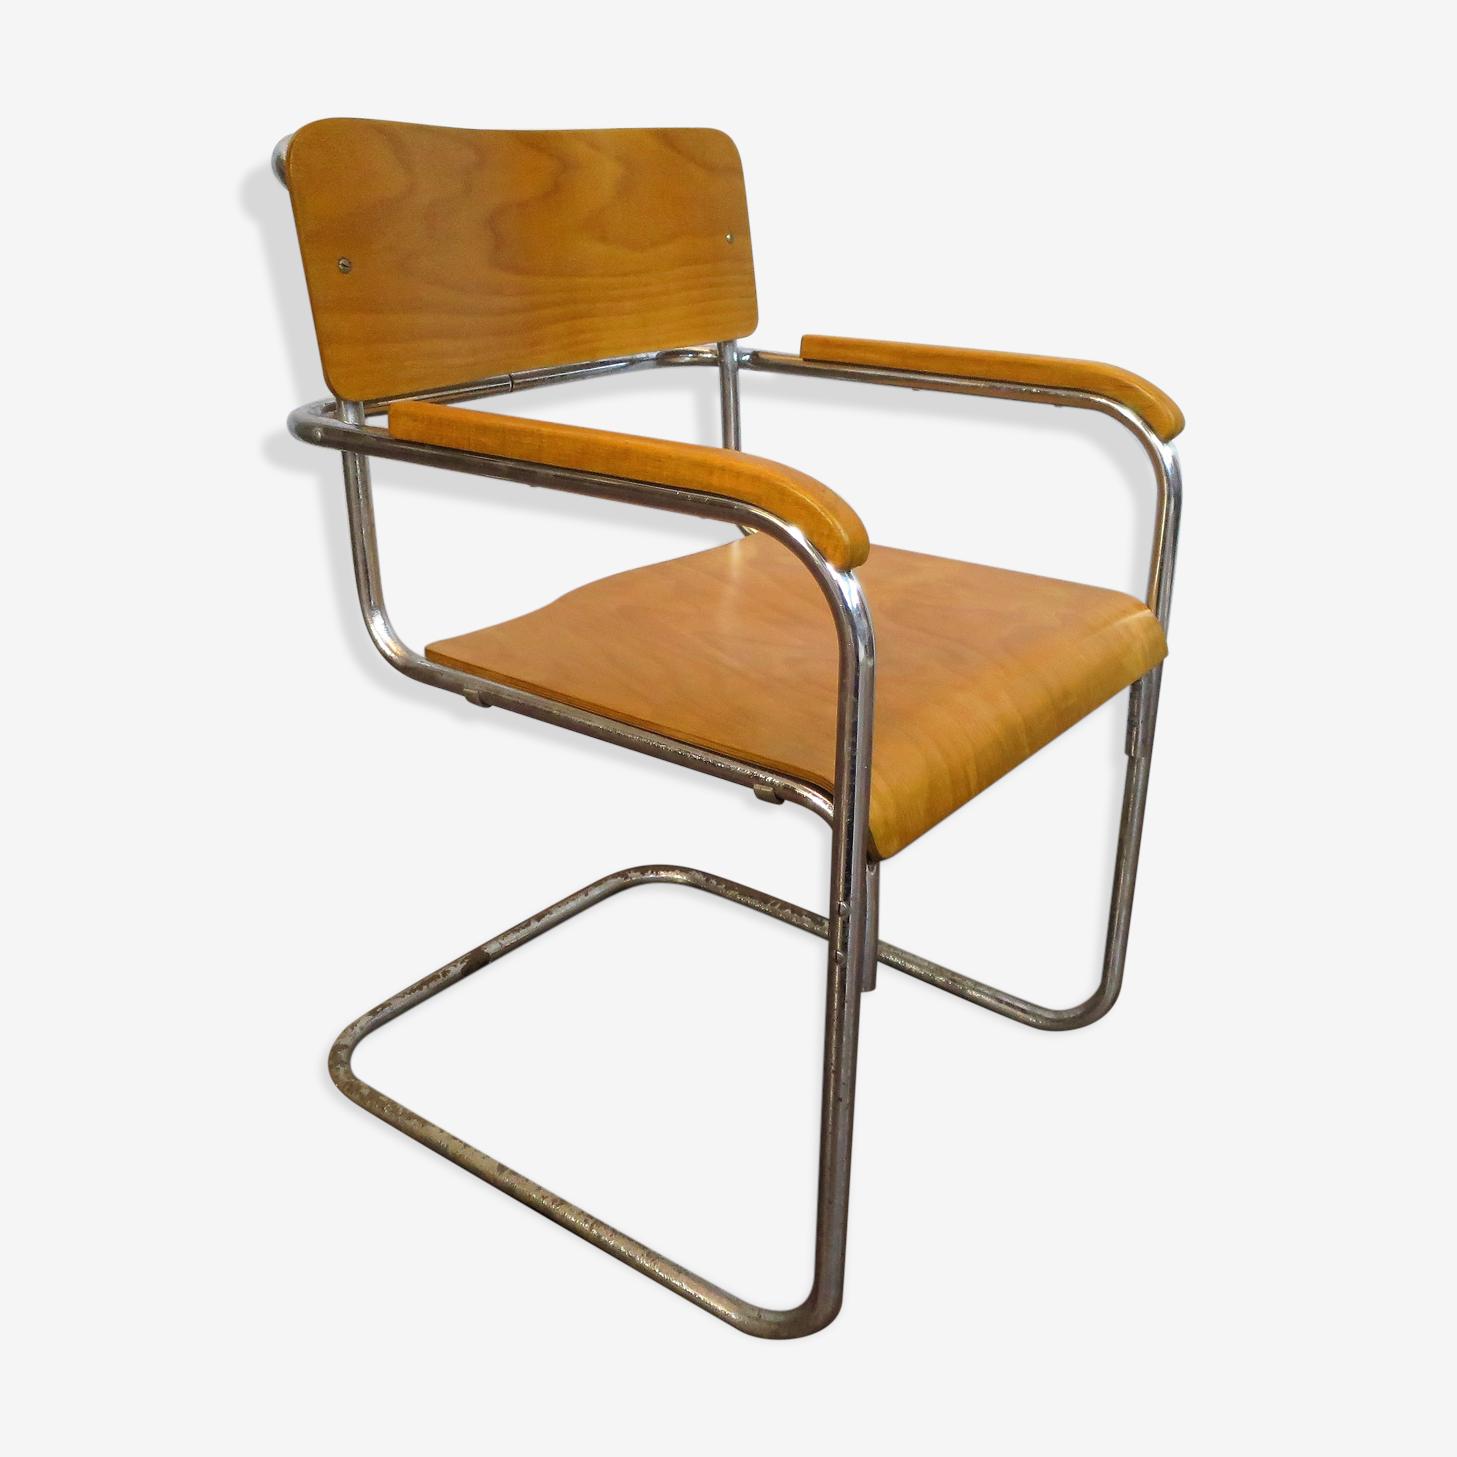 Fauteuil B34 de Marcel Breuer 1950